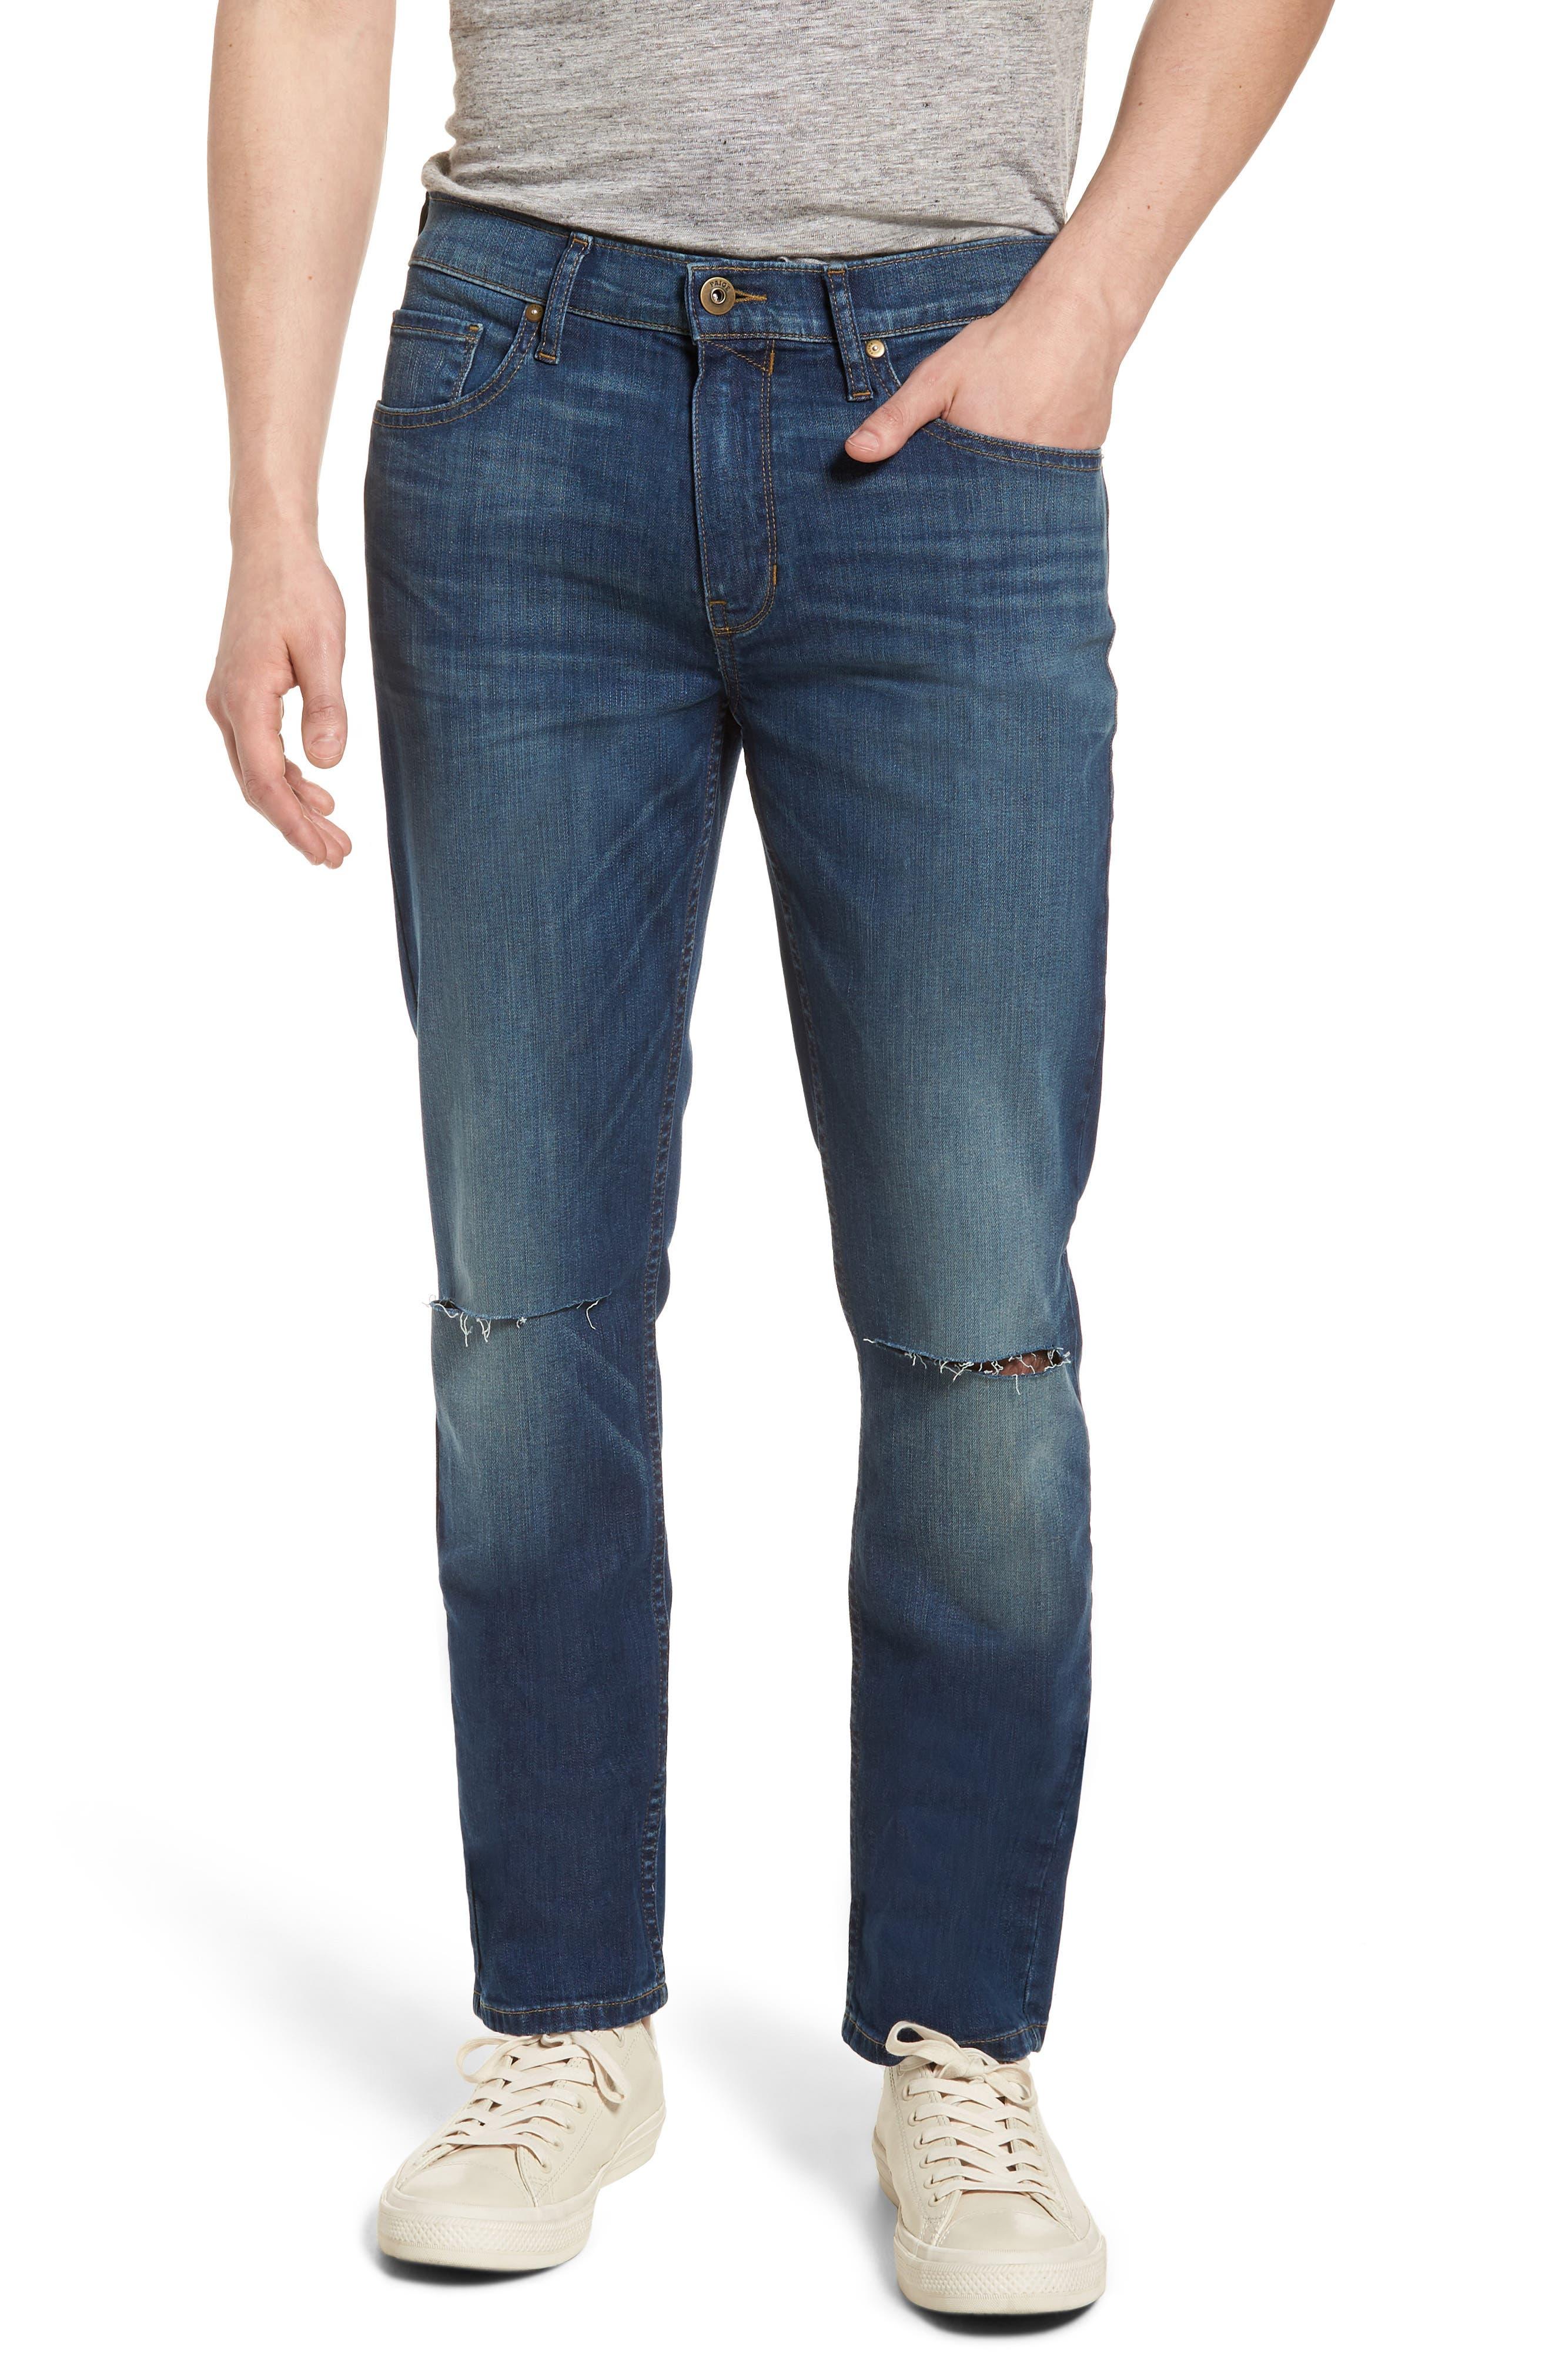 Lennox Slim Fit Jeans,                         Main,                         color, Harlan Destructed